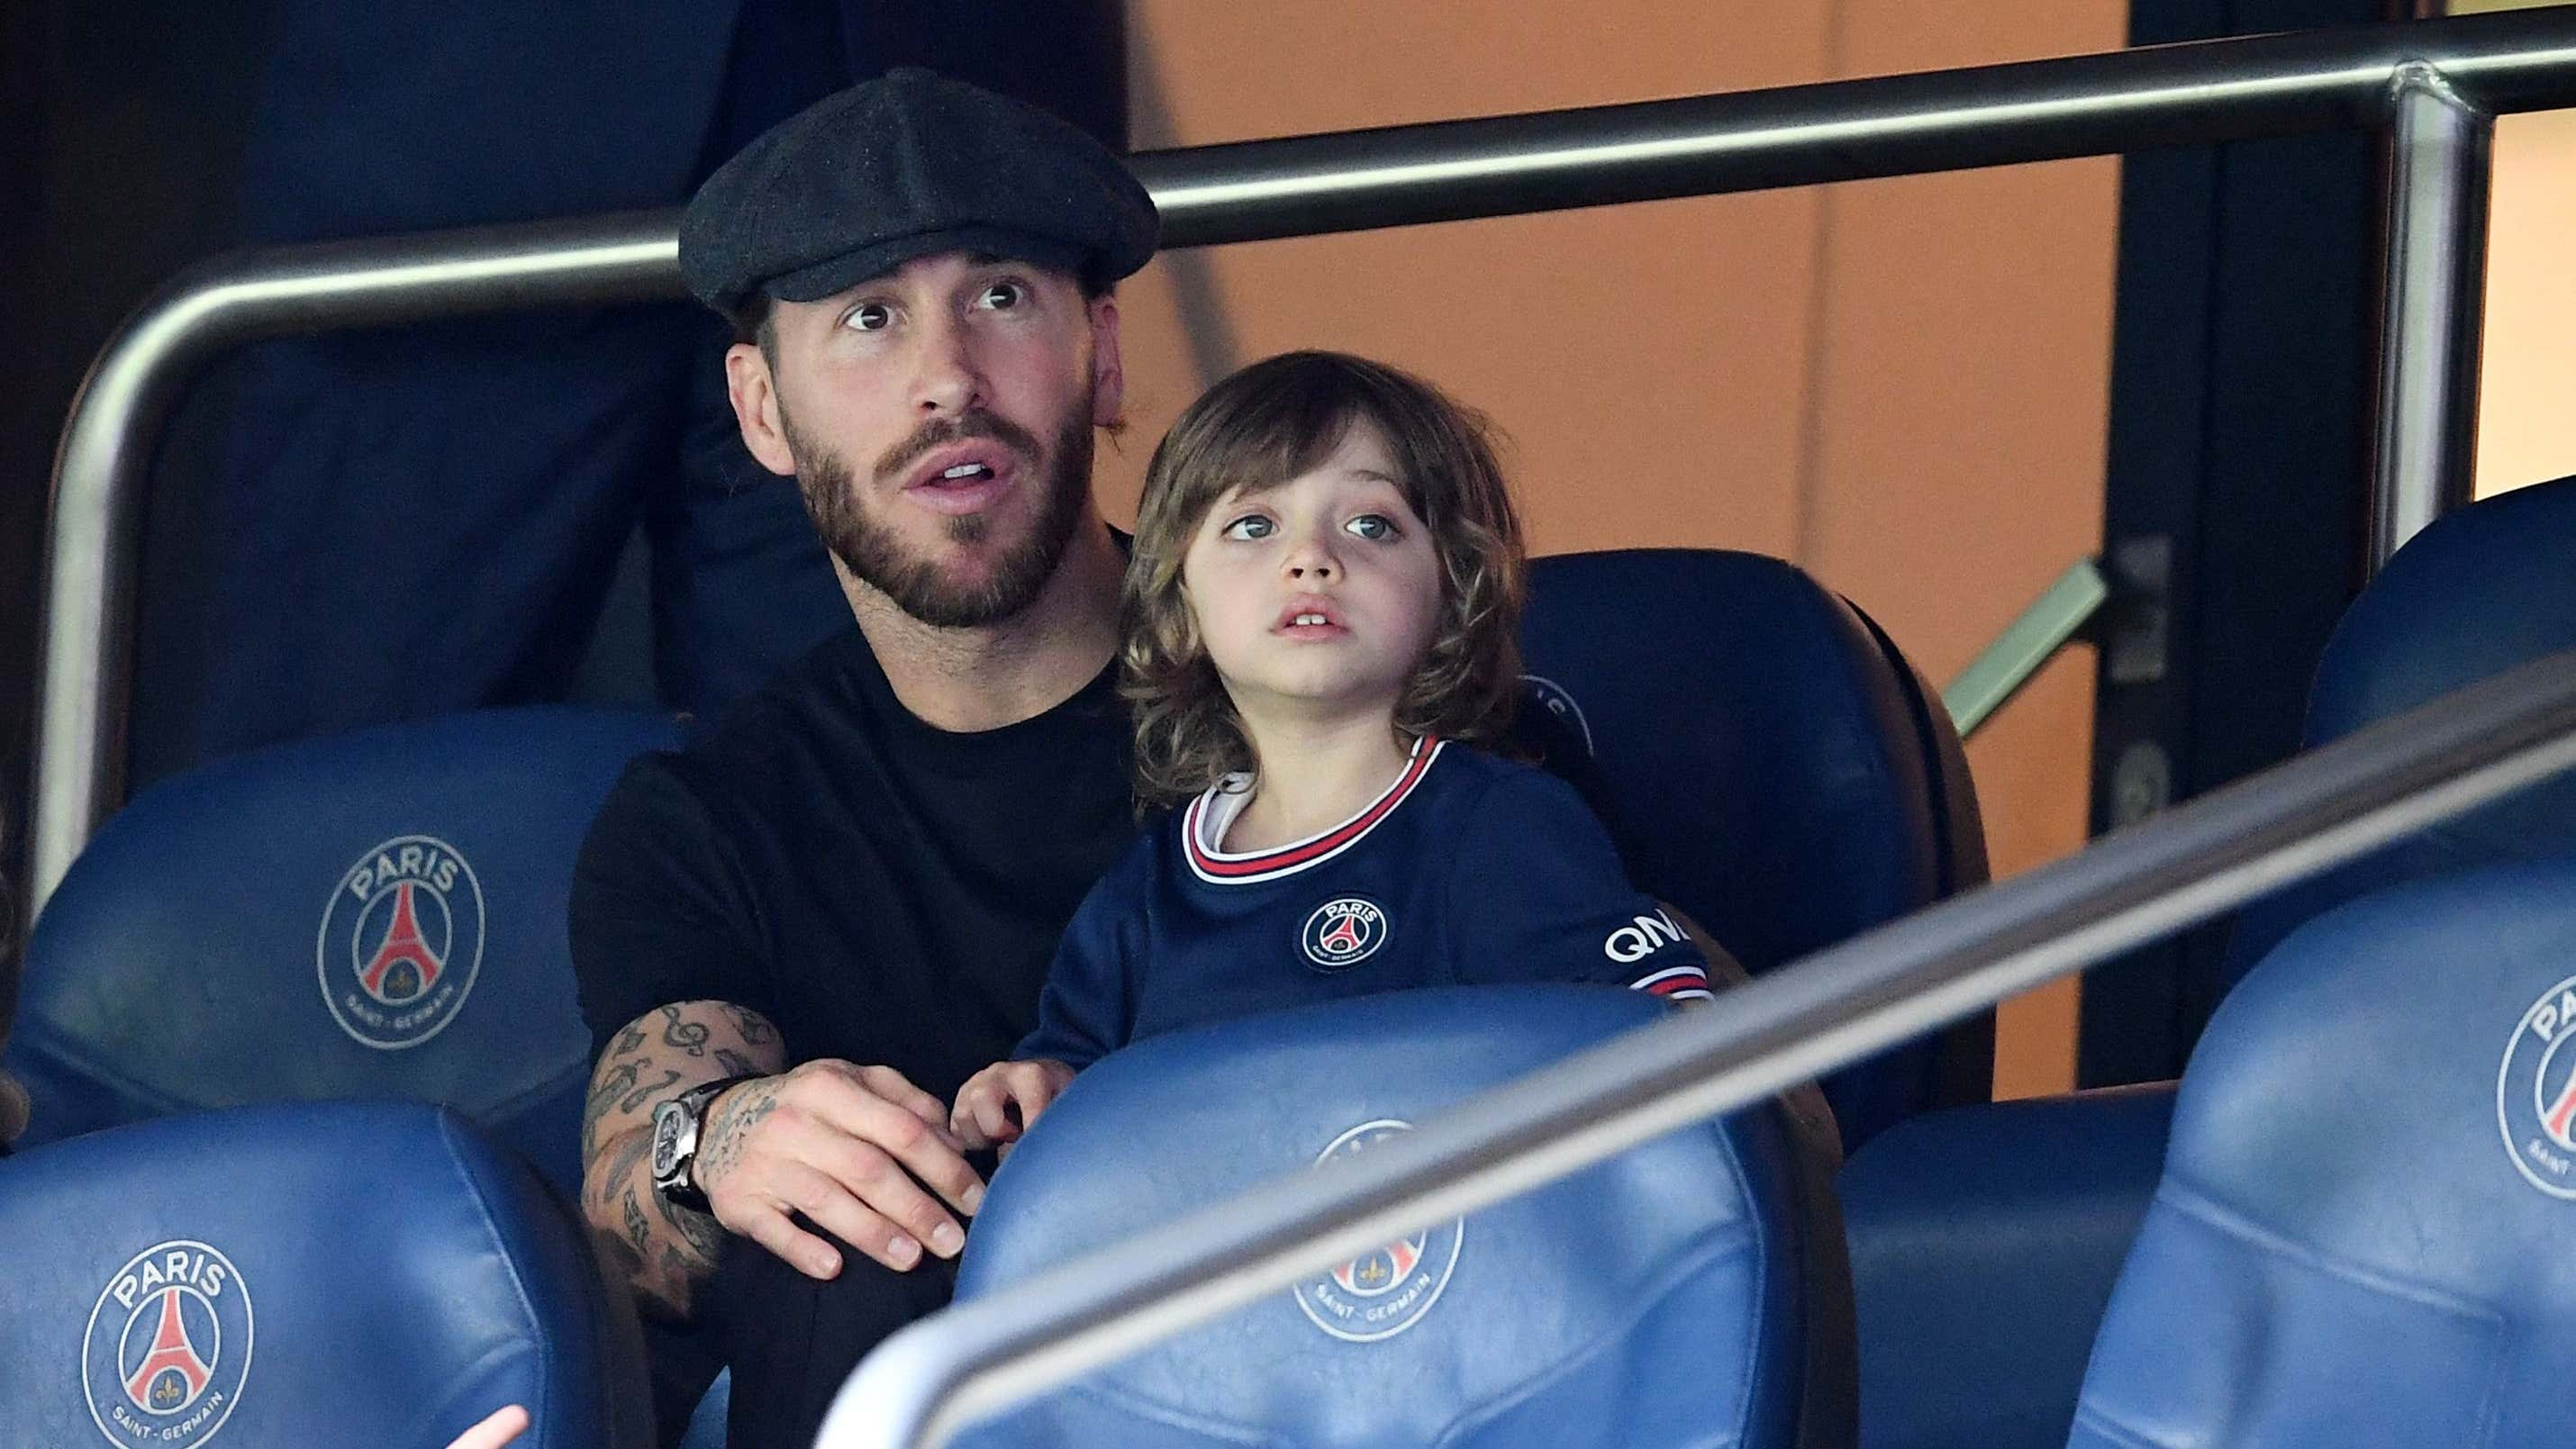 Sergio Ramos' PSG move is turning into a nightmare   Goal.com